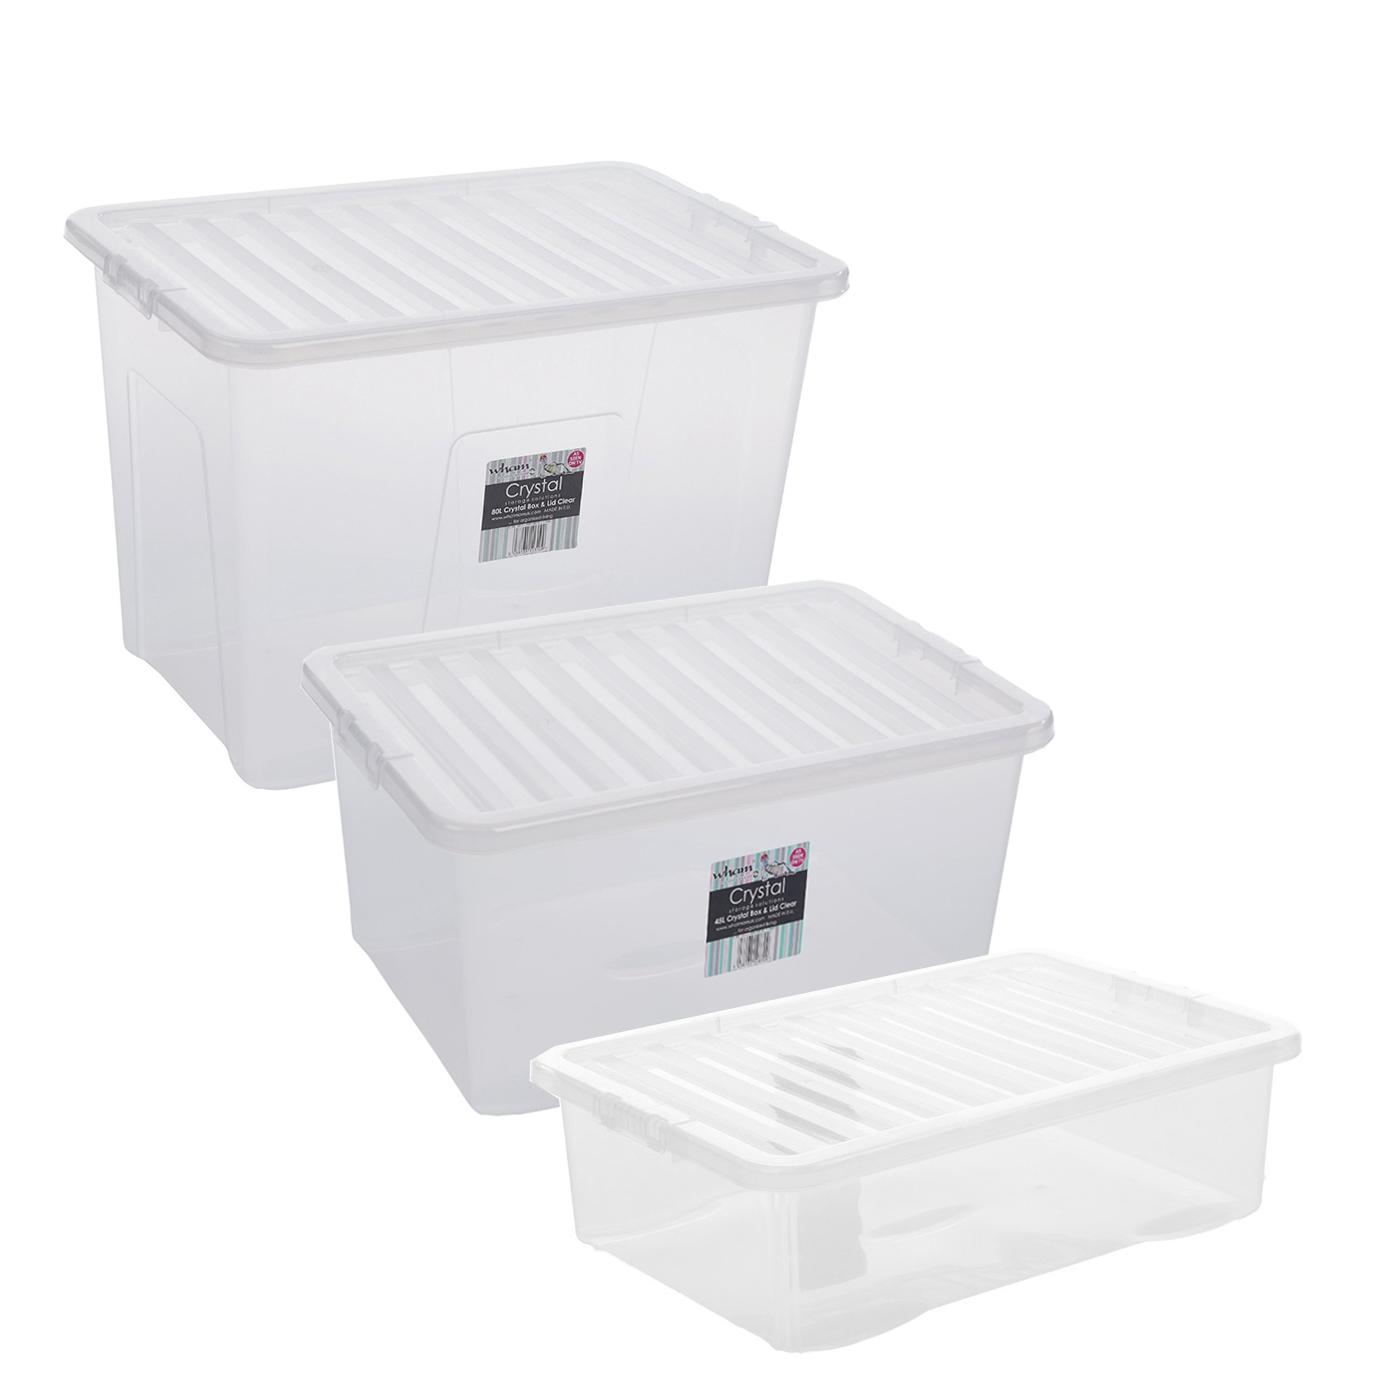 new tesco underbed storage box 32 litre 45 litre and 80. Black Bedroom Furniture Sets. Home Design Ideas